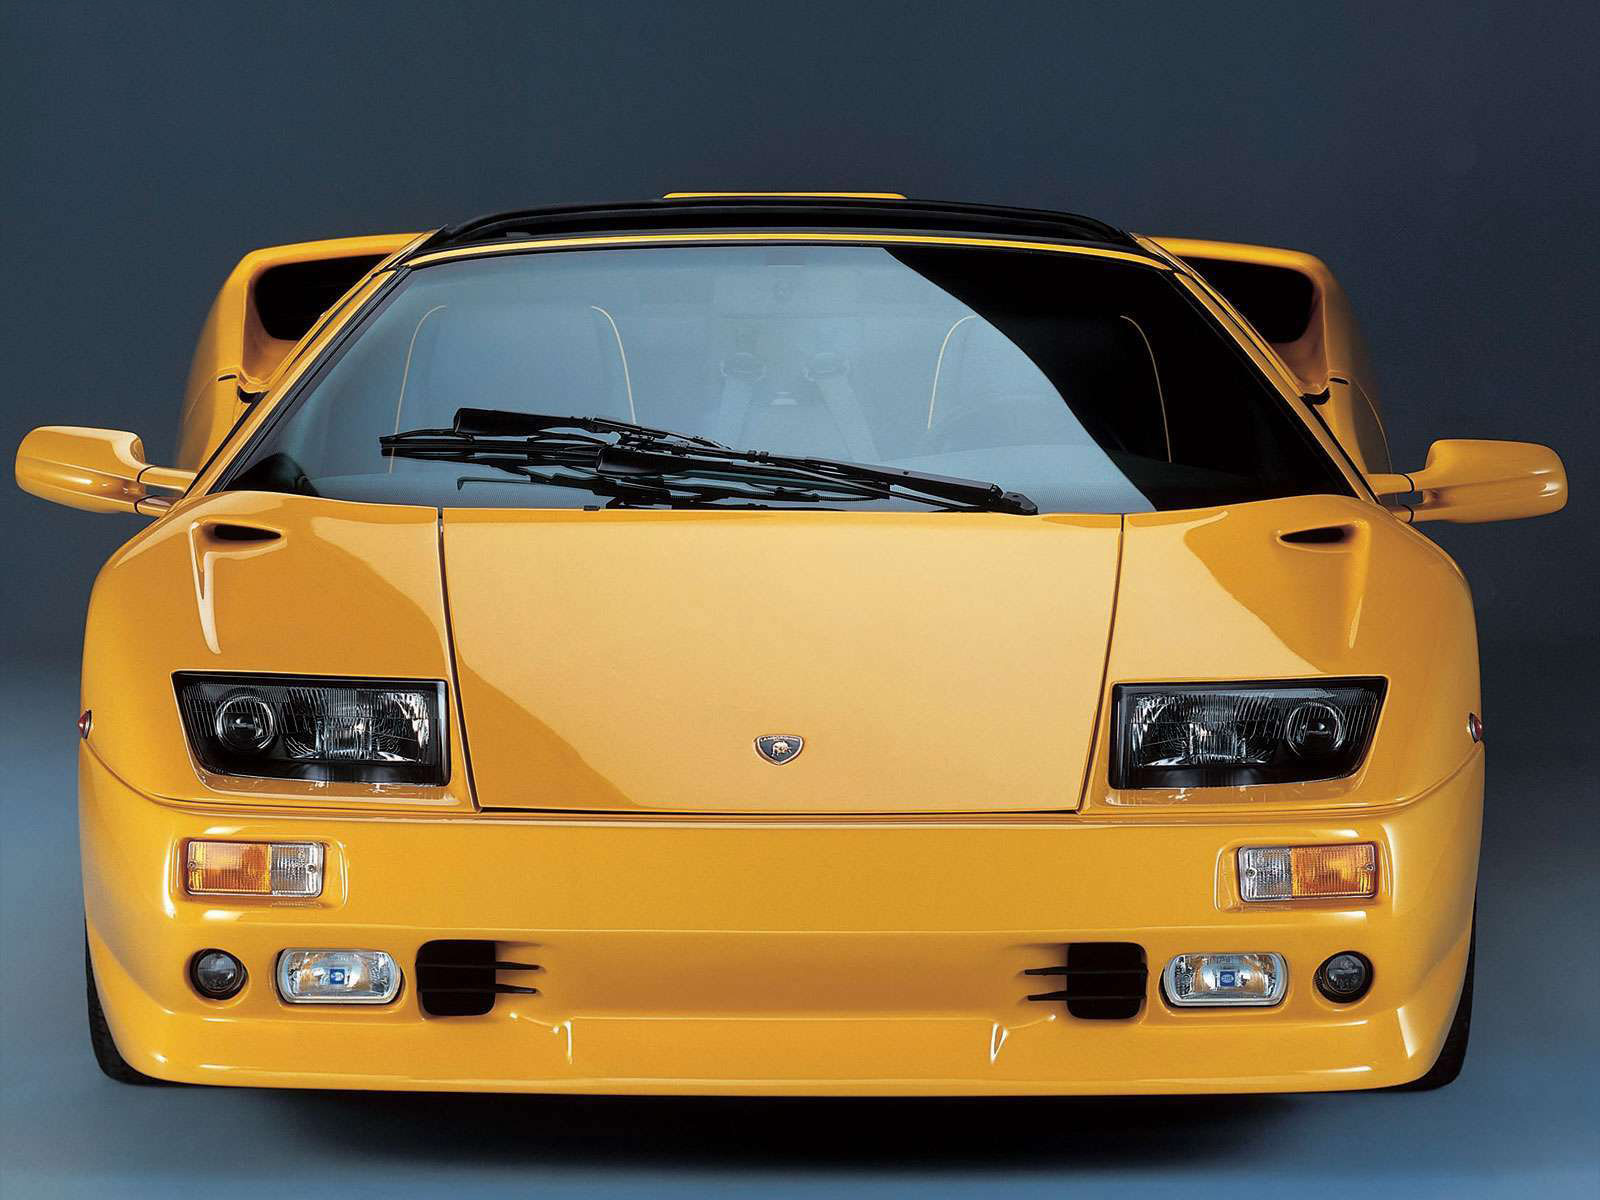 1996 Lamborghini Diablo Roadster Accident Lawyers Info